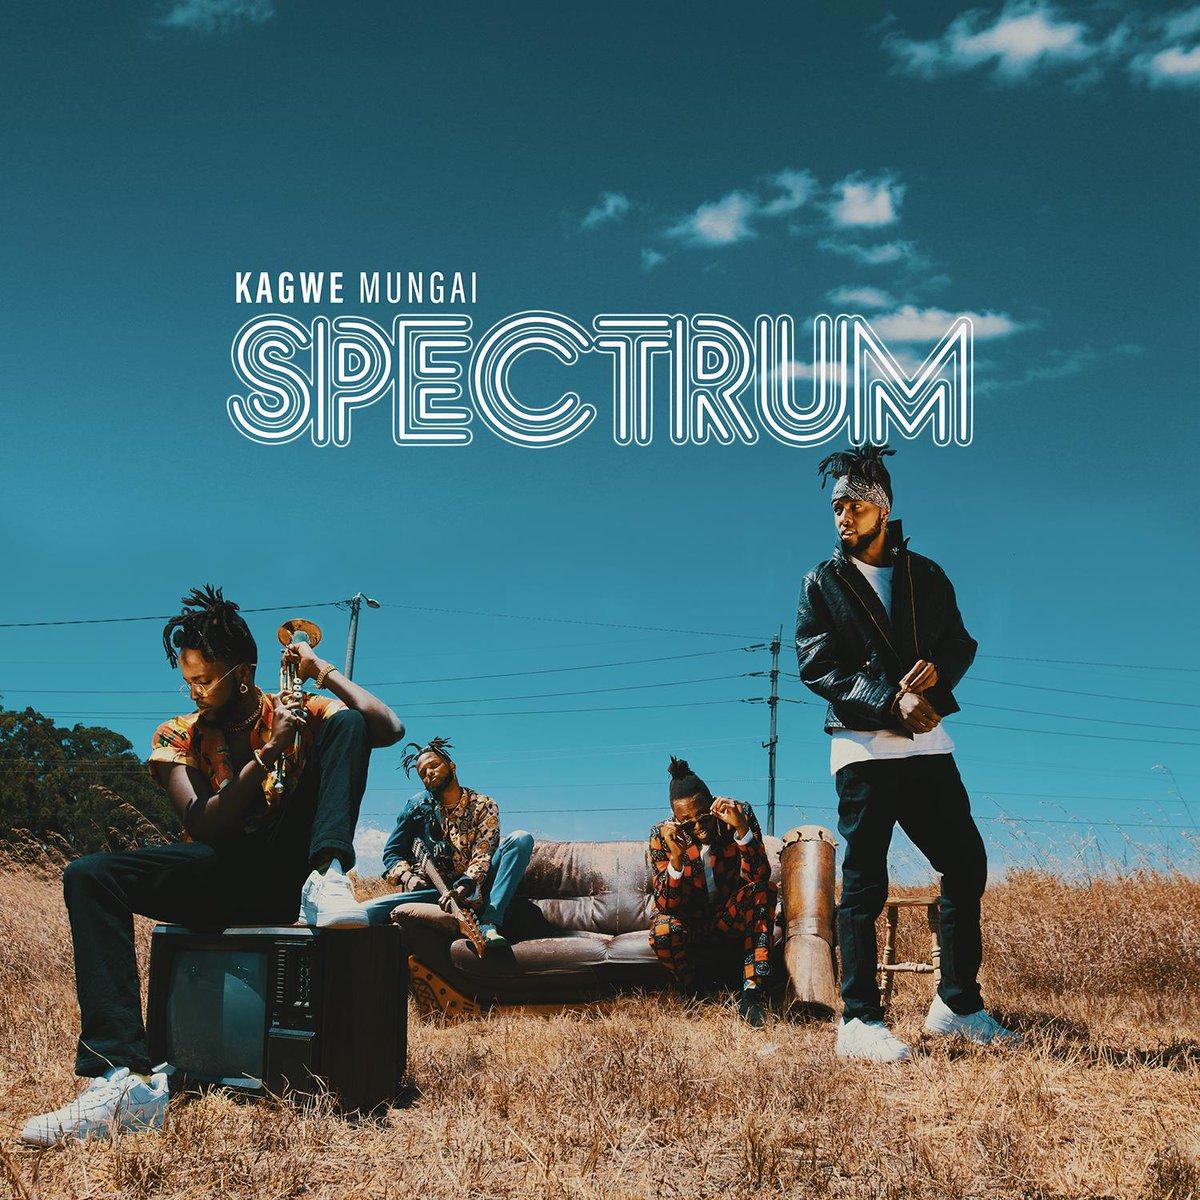 Spectrum-Kagwe-Mungai.jpg